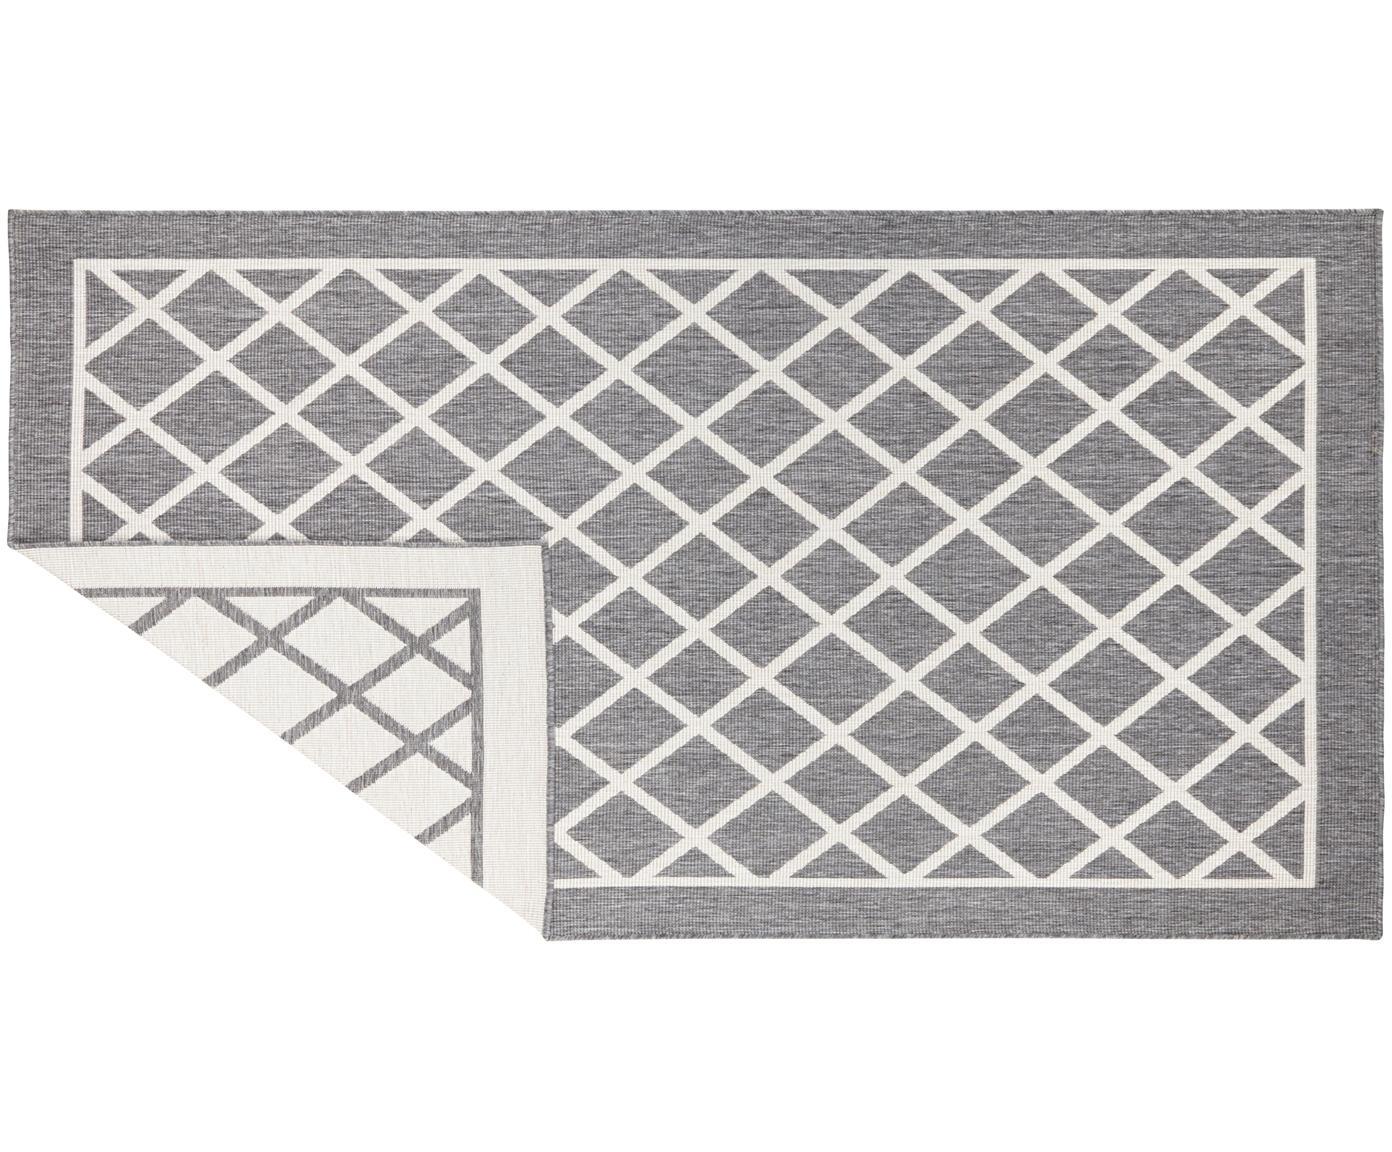 Alfombra reversible de interior/exterior Sydney, Gris, crema, An 80 x L 150 cm (Tamaño XS)